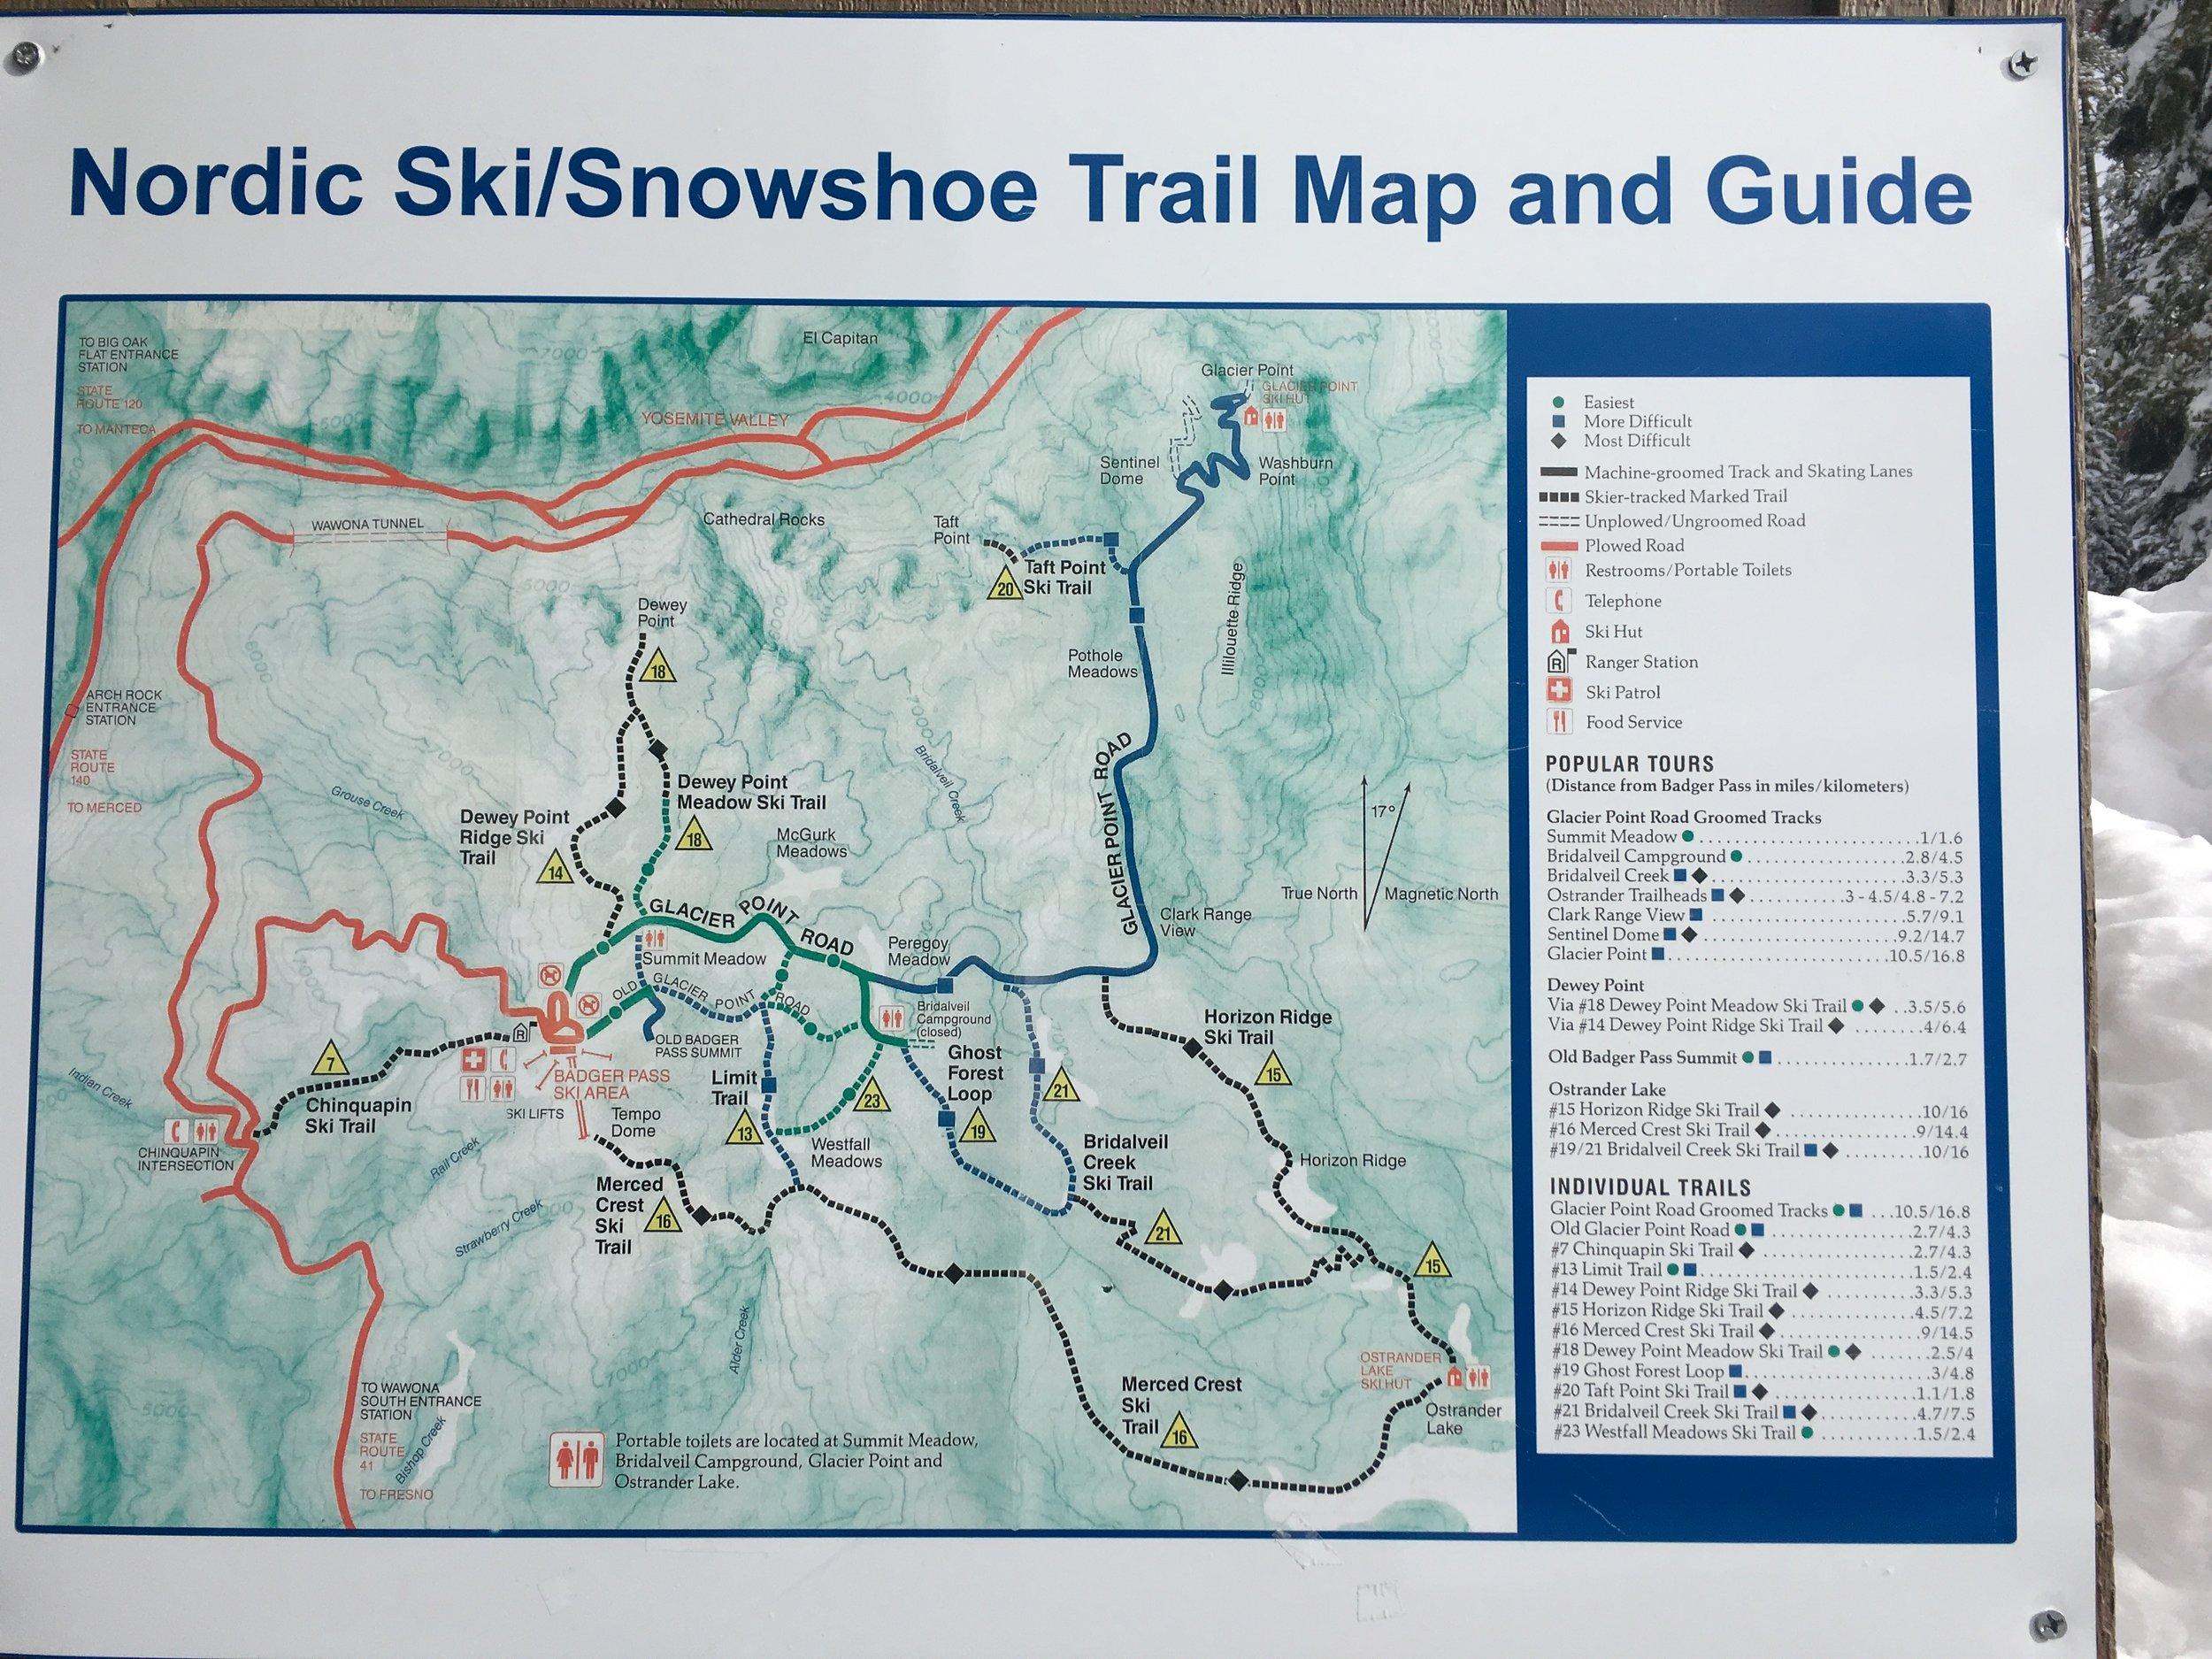 So many trails!